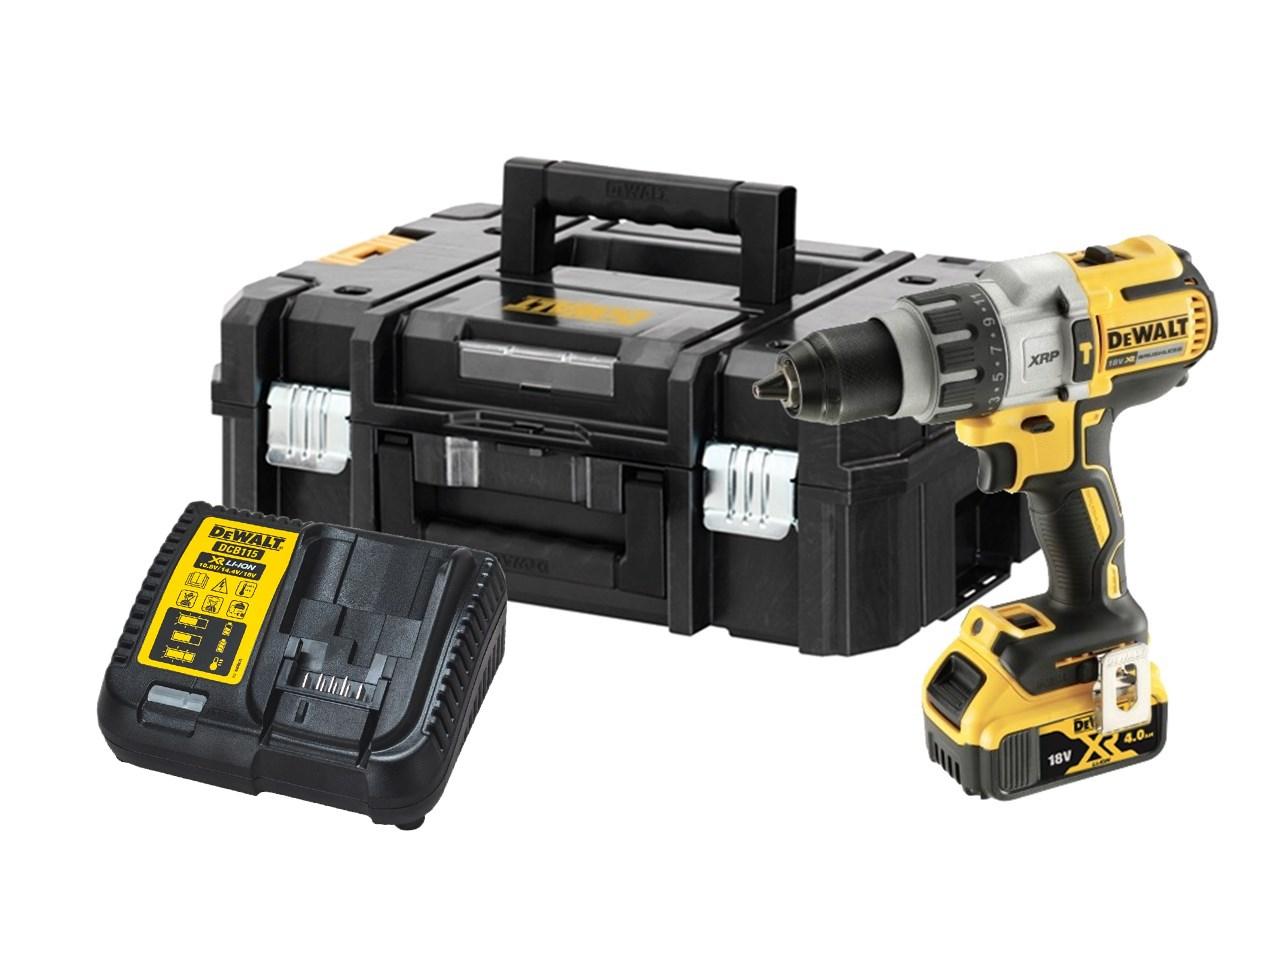 Dewalt DCD996M1 with 4 amp battery, case etc £94 @ FFX